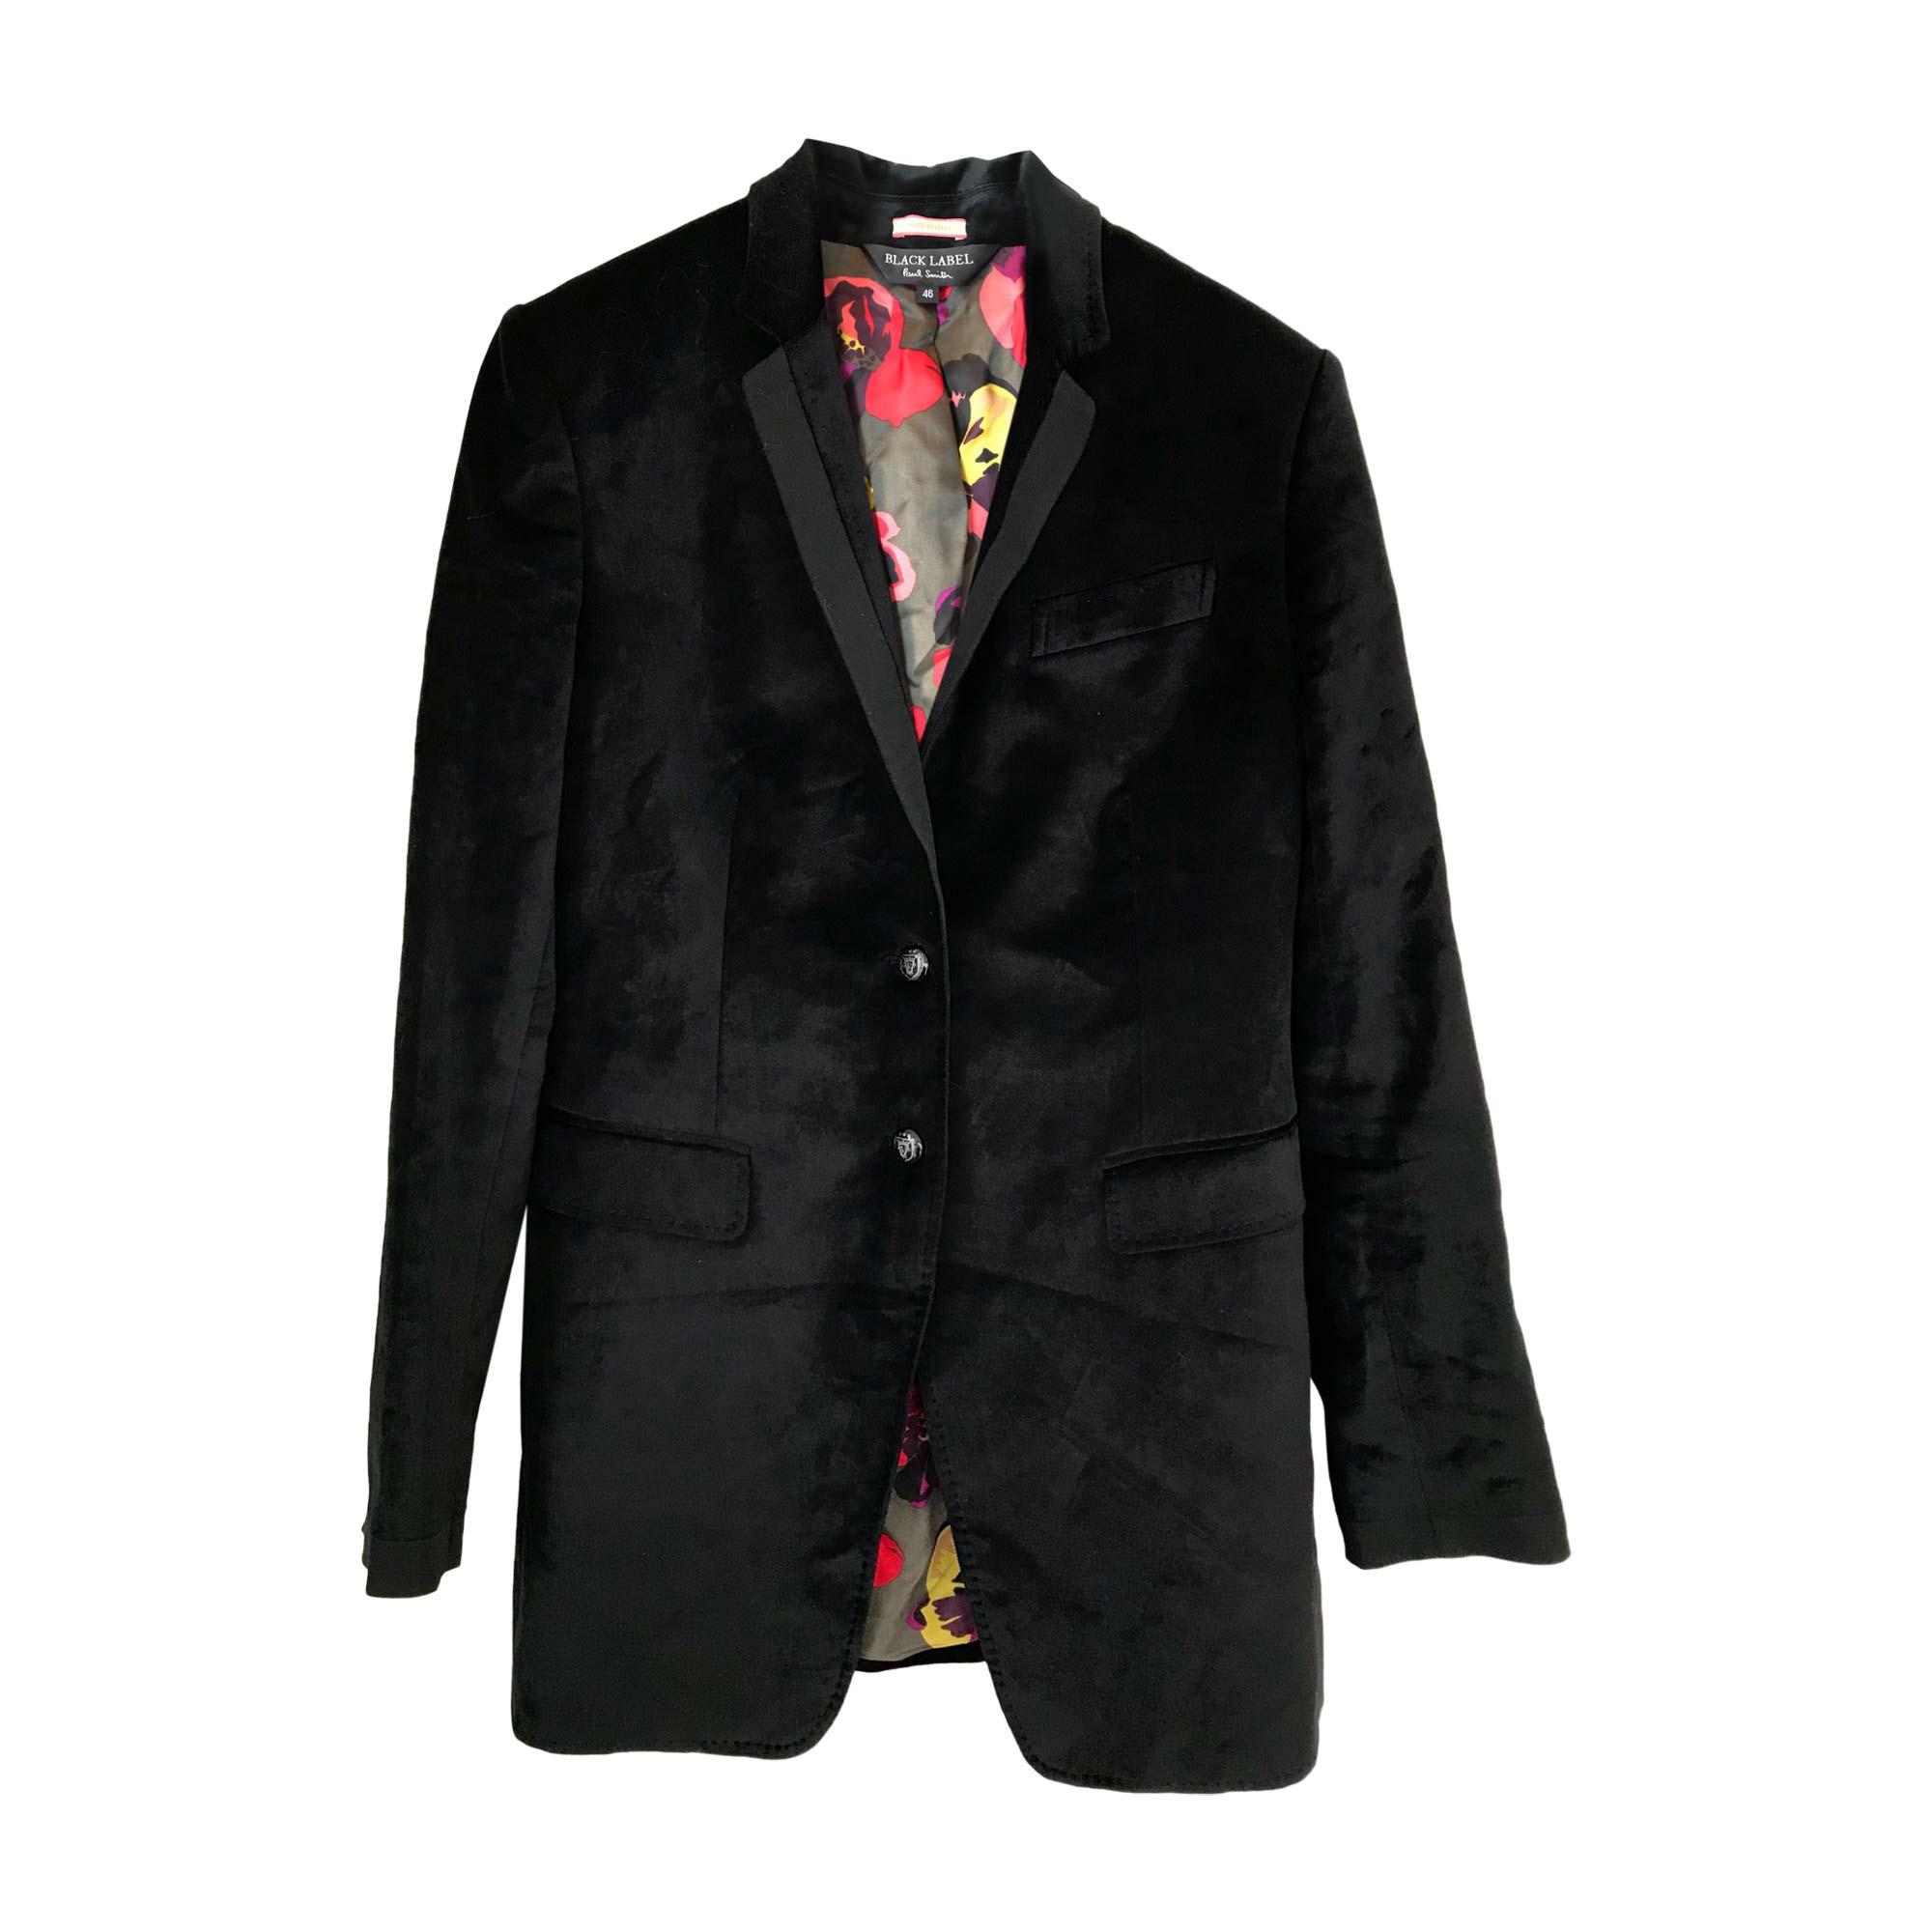 Blazer, veste tailleur PAUL SMITH Noir